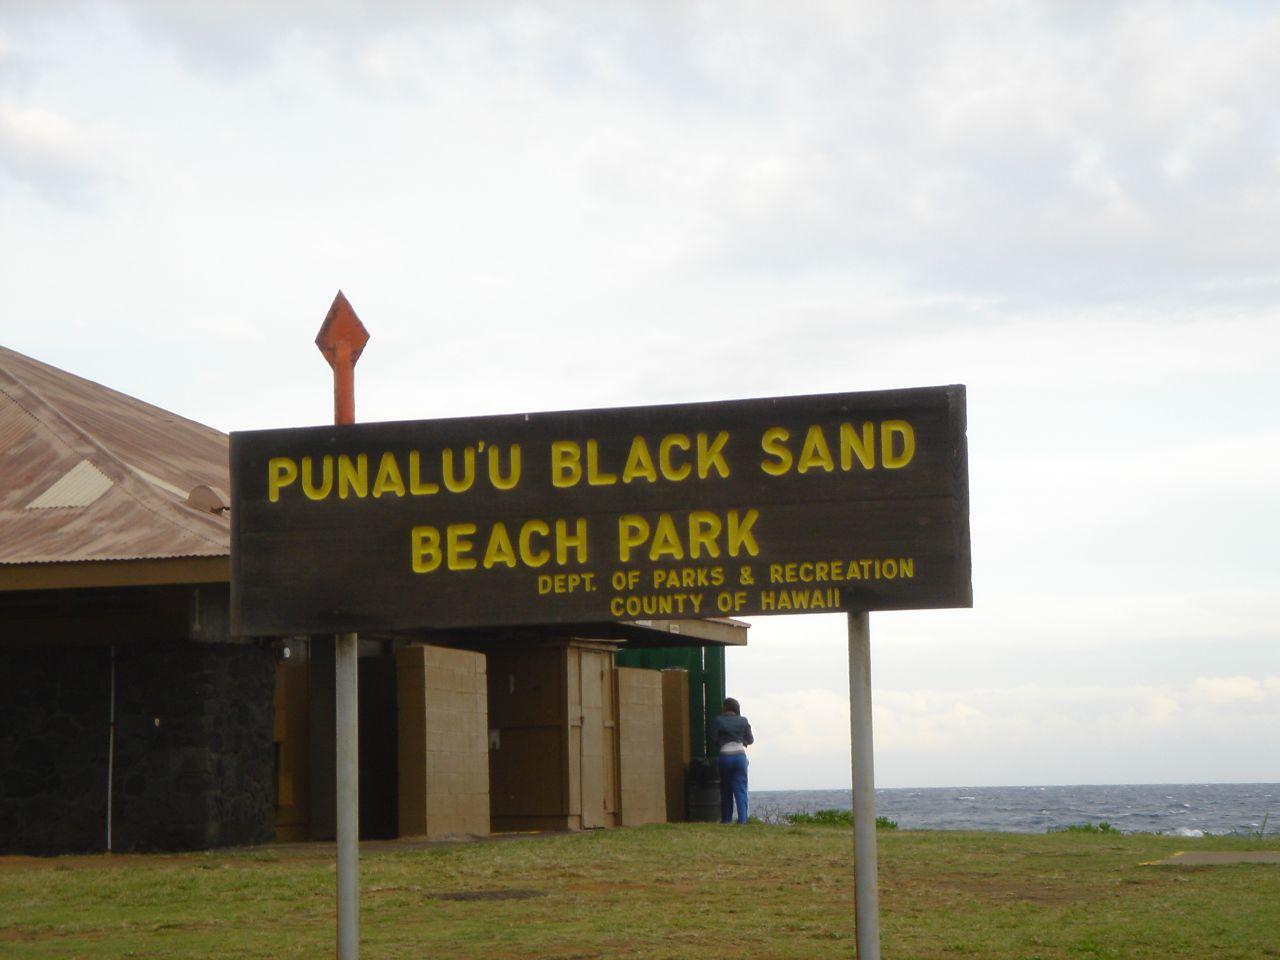 Sign at Punalu'u Black Sand Beach Park, Hawaii